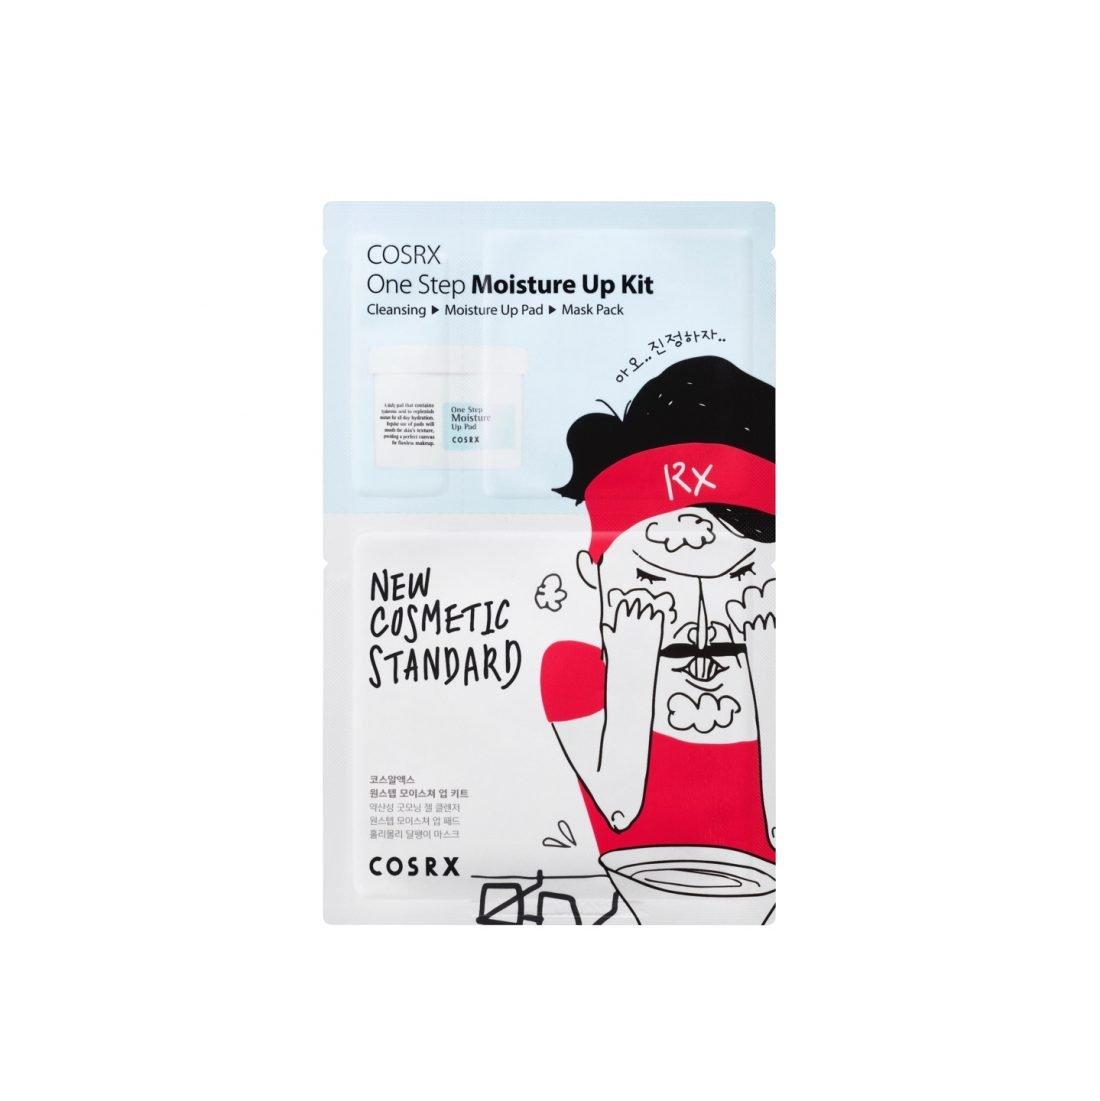 COSRX One Step Moisture Up Kit, 1 Sheet